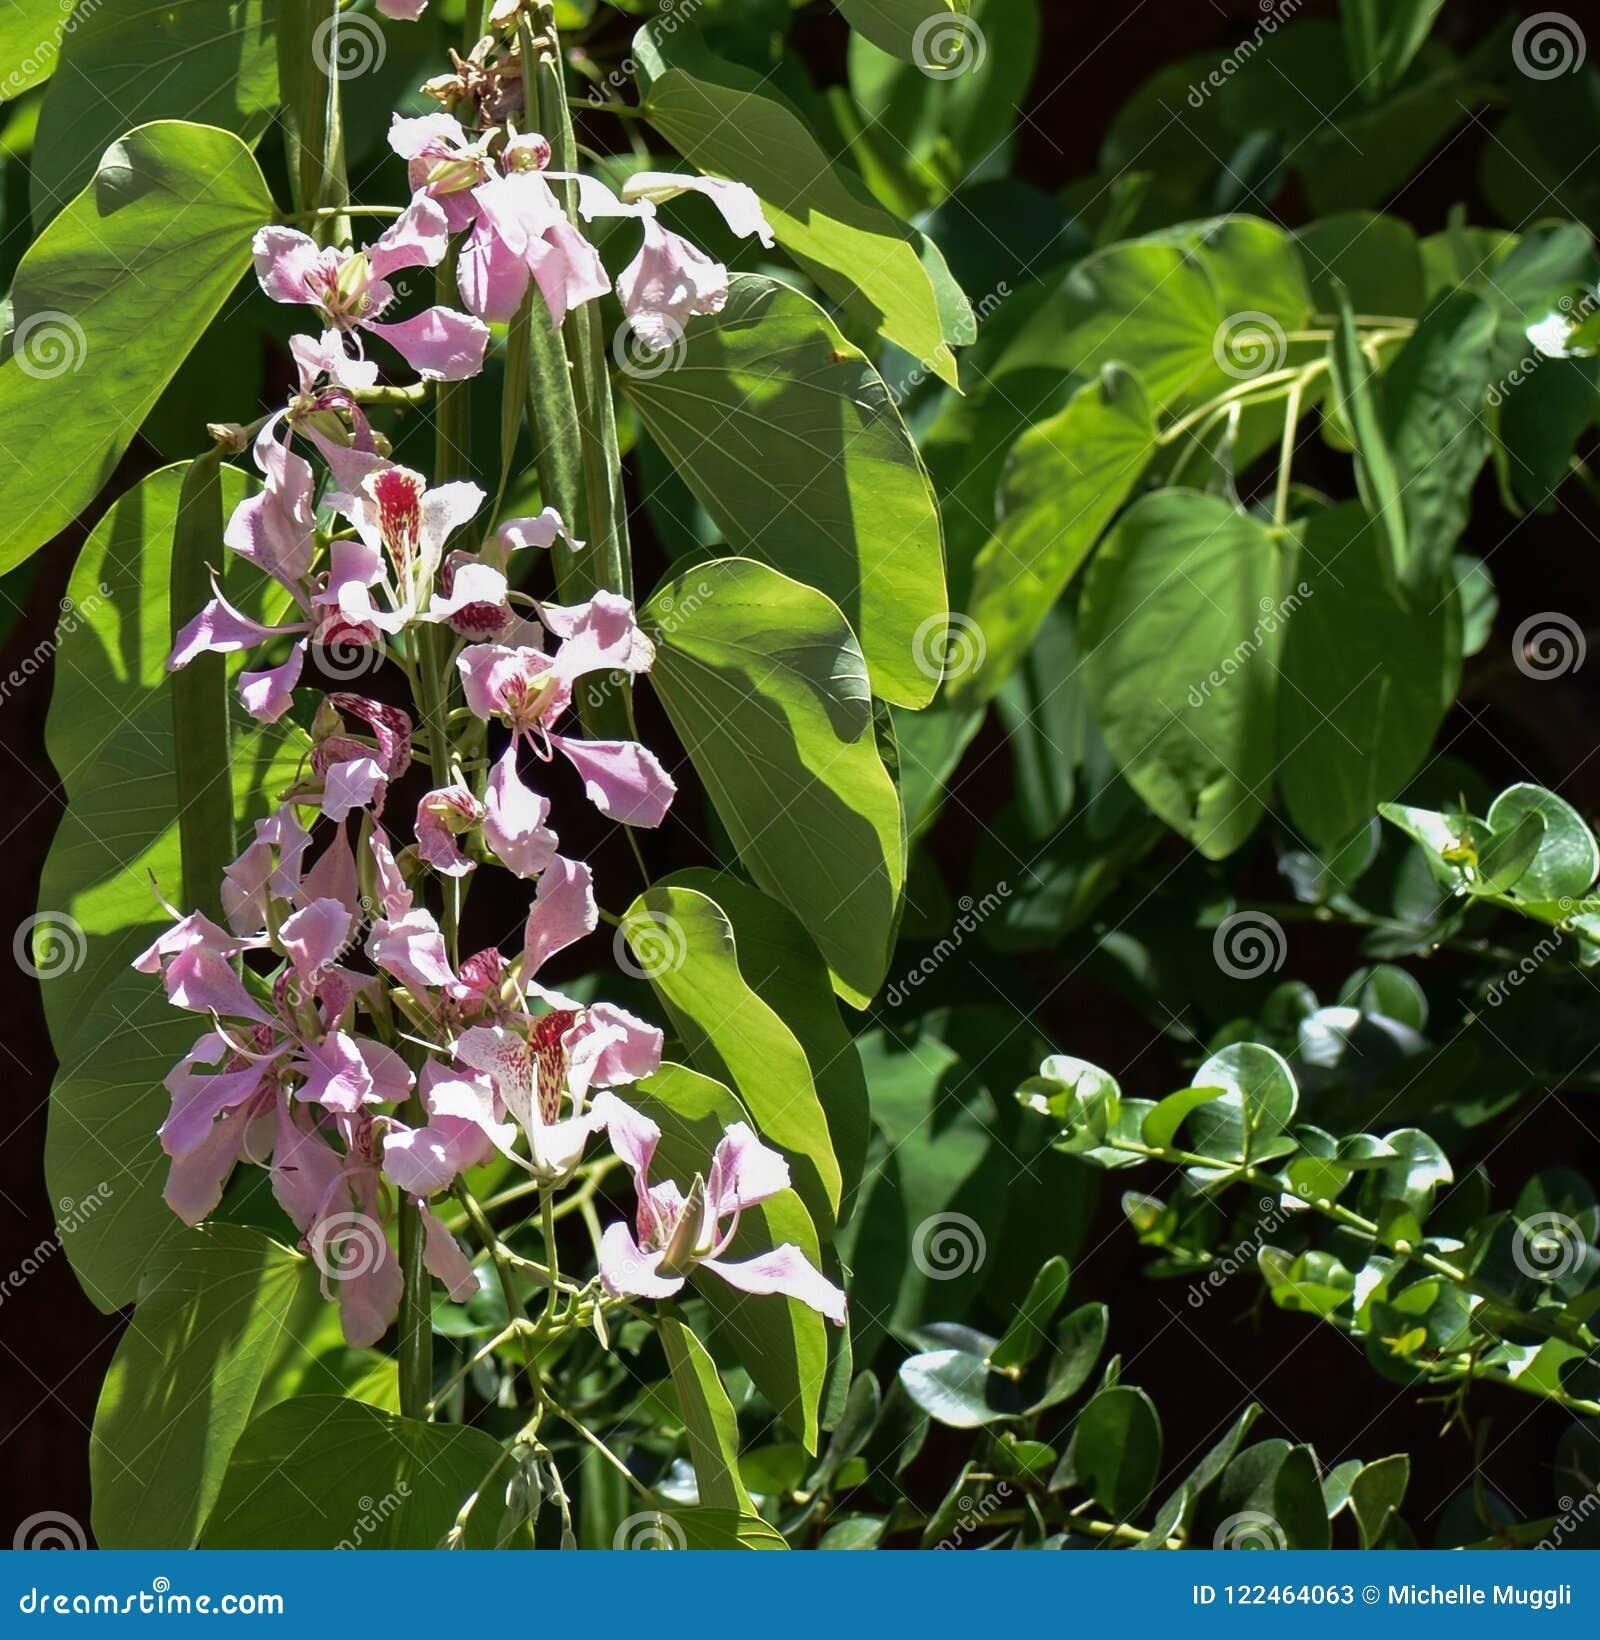 Hawaiian Hanging Tropical Flowers Stock Image Image Of Flower